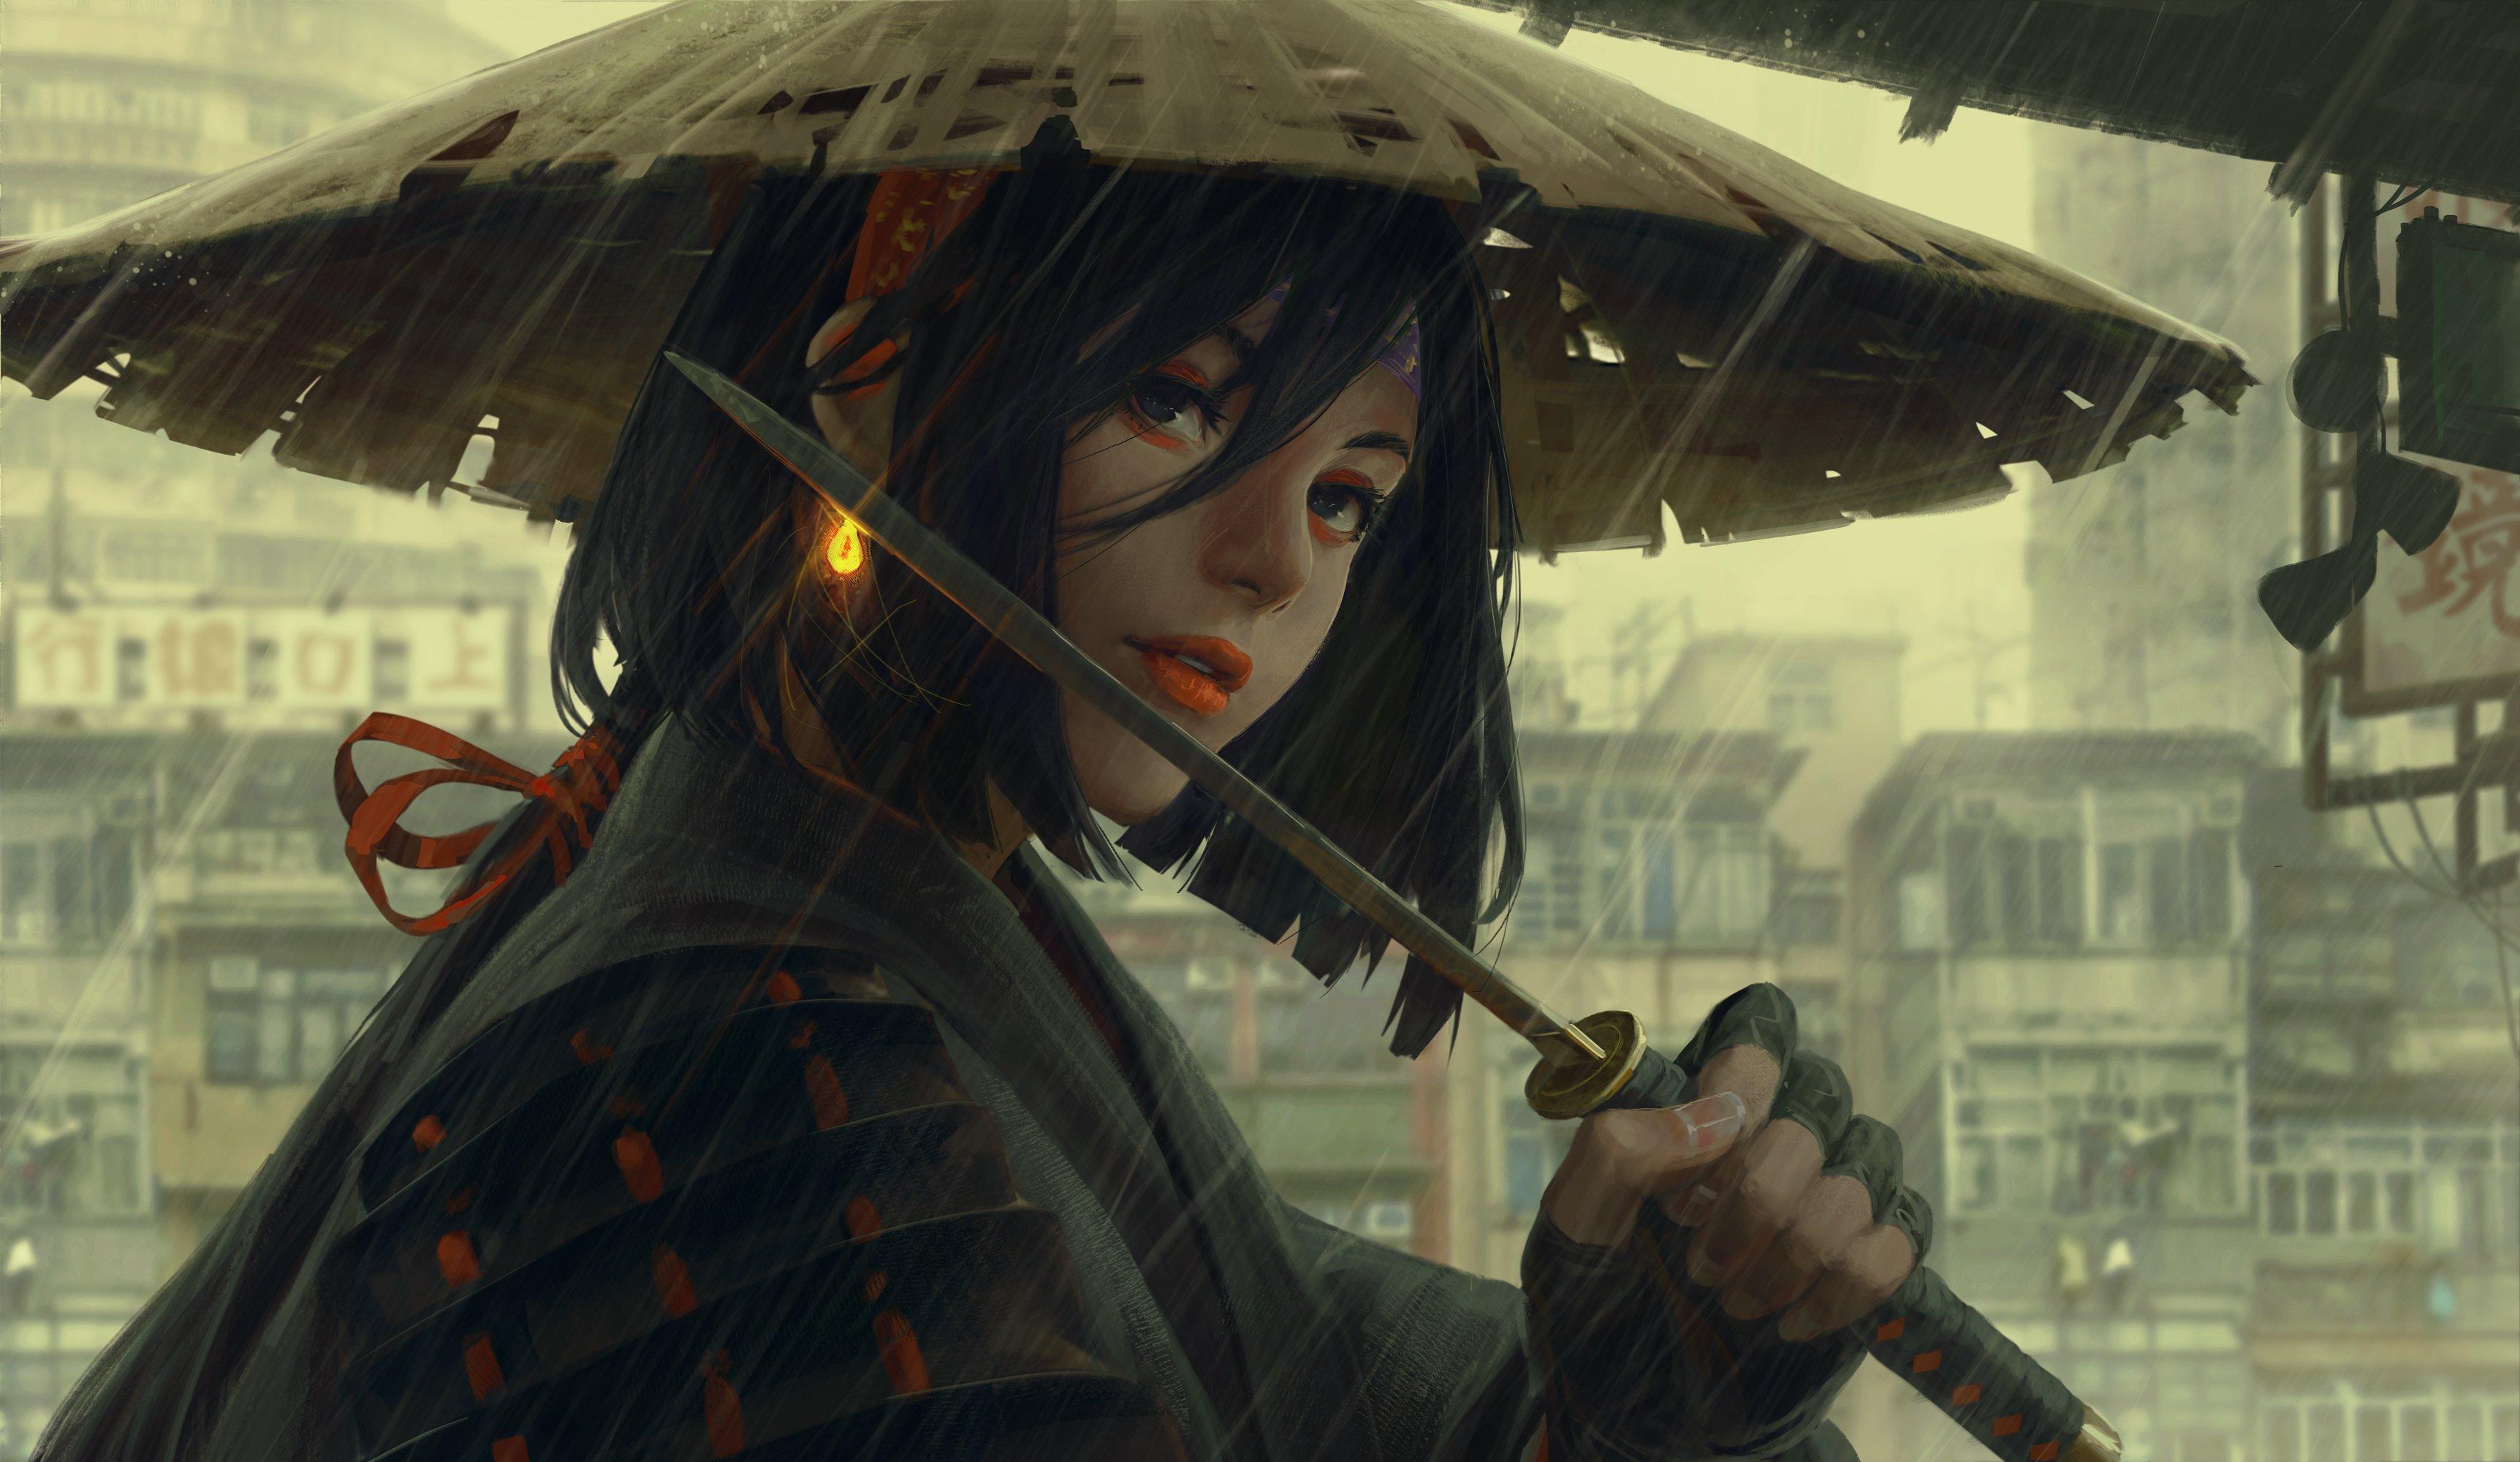 Women Warrior Artwork Sword Rain Cyberpunk Cyberpunk: Zerochan Anime Image Board